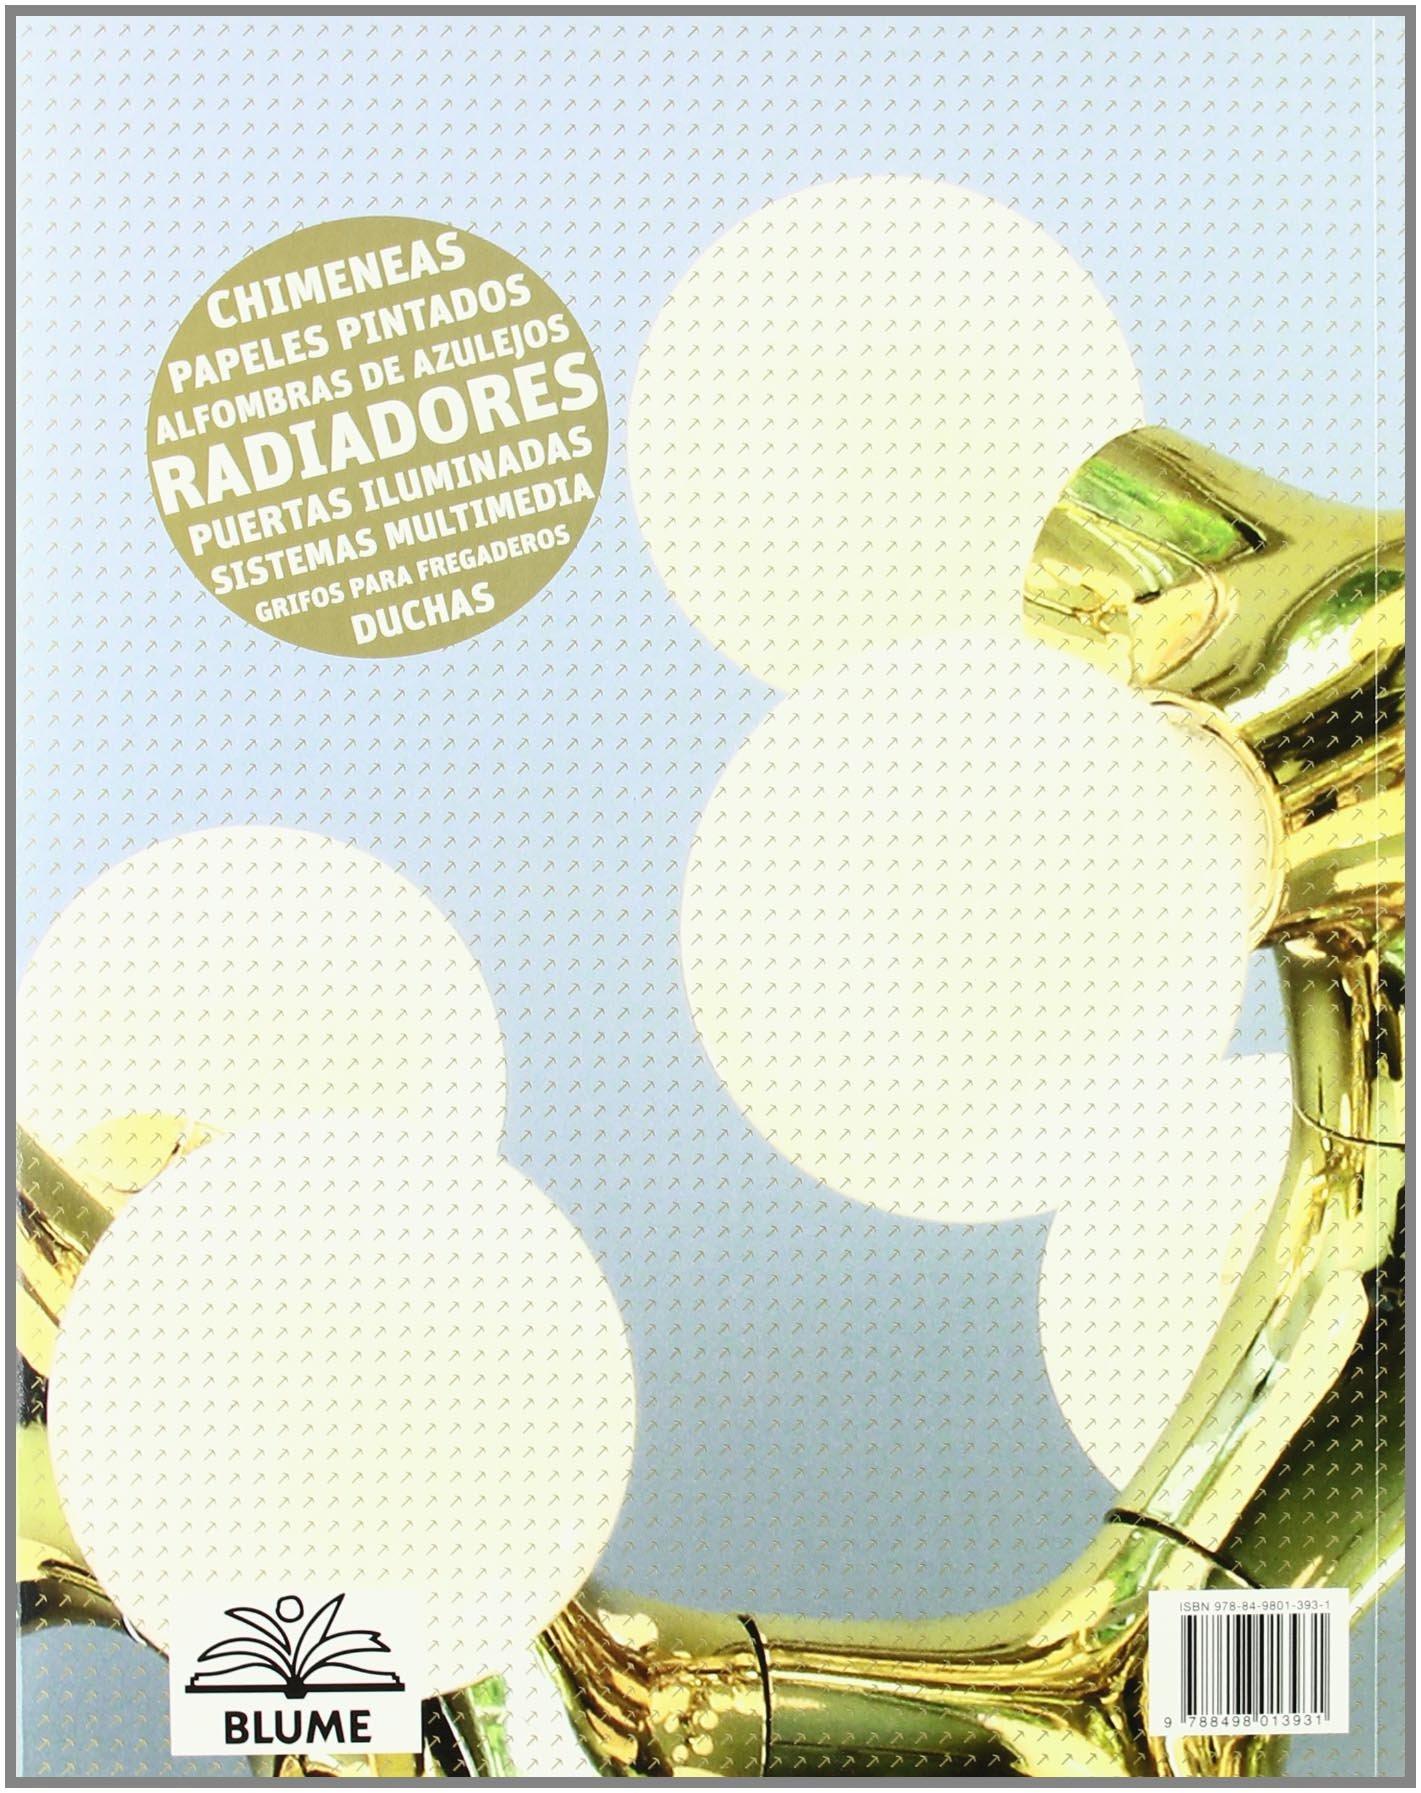 1000 detalles de interiorismo para casa: GERALDINE RUDGE: 9788498013931: Amazon.com: Books